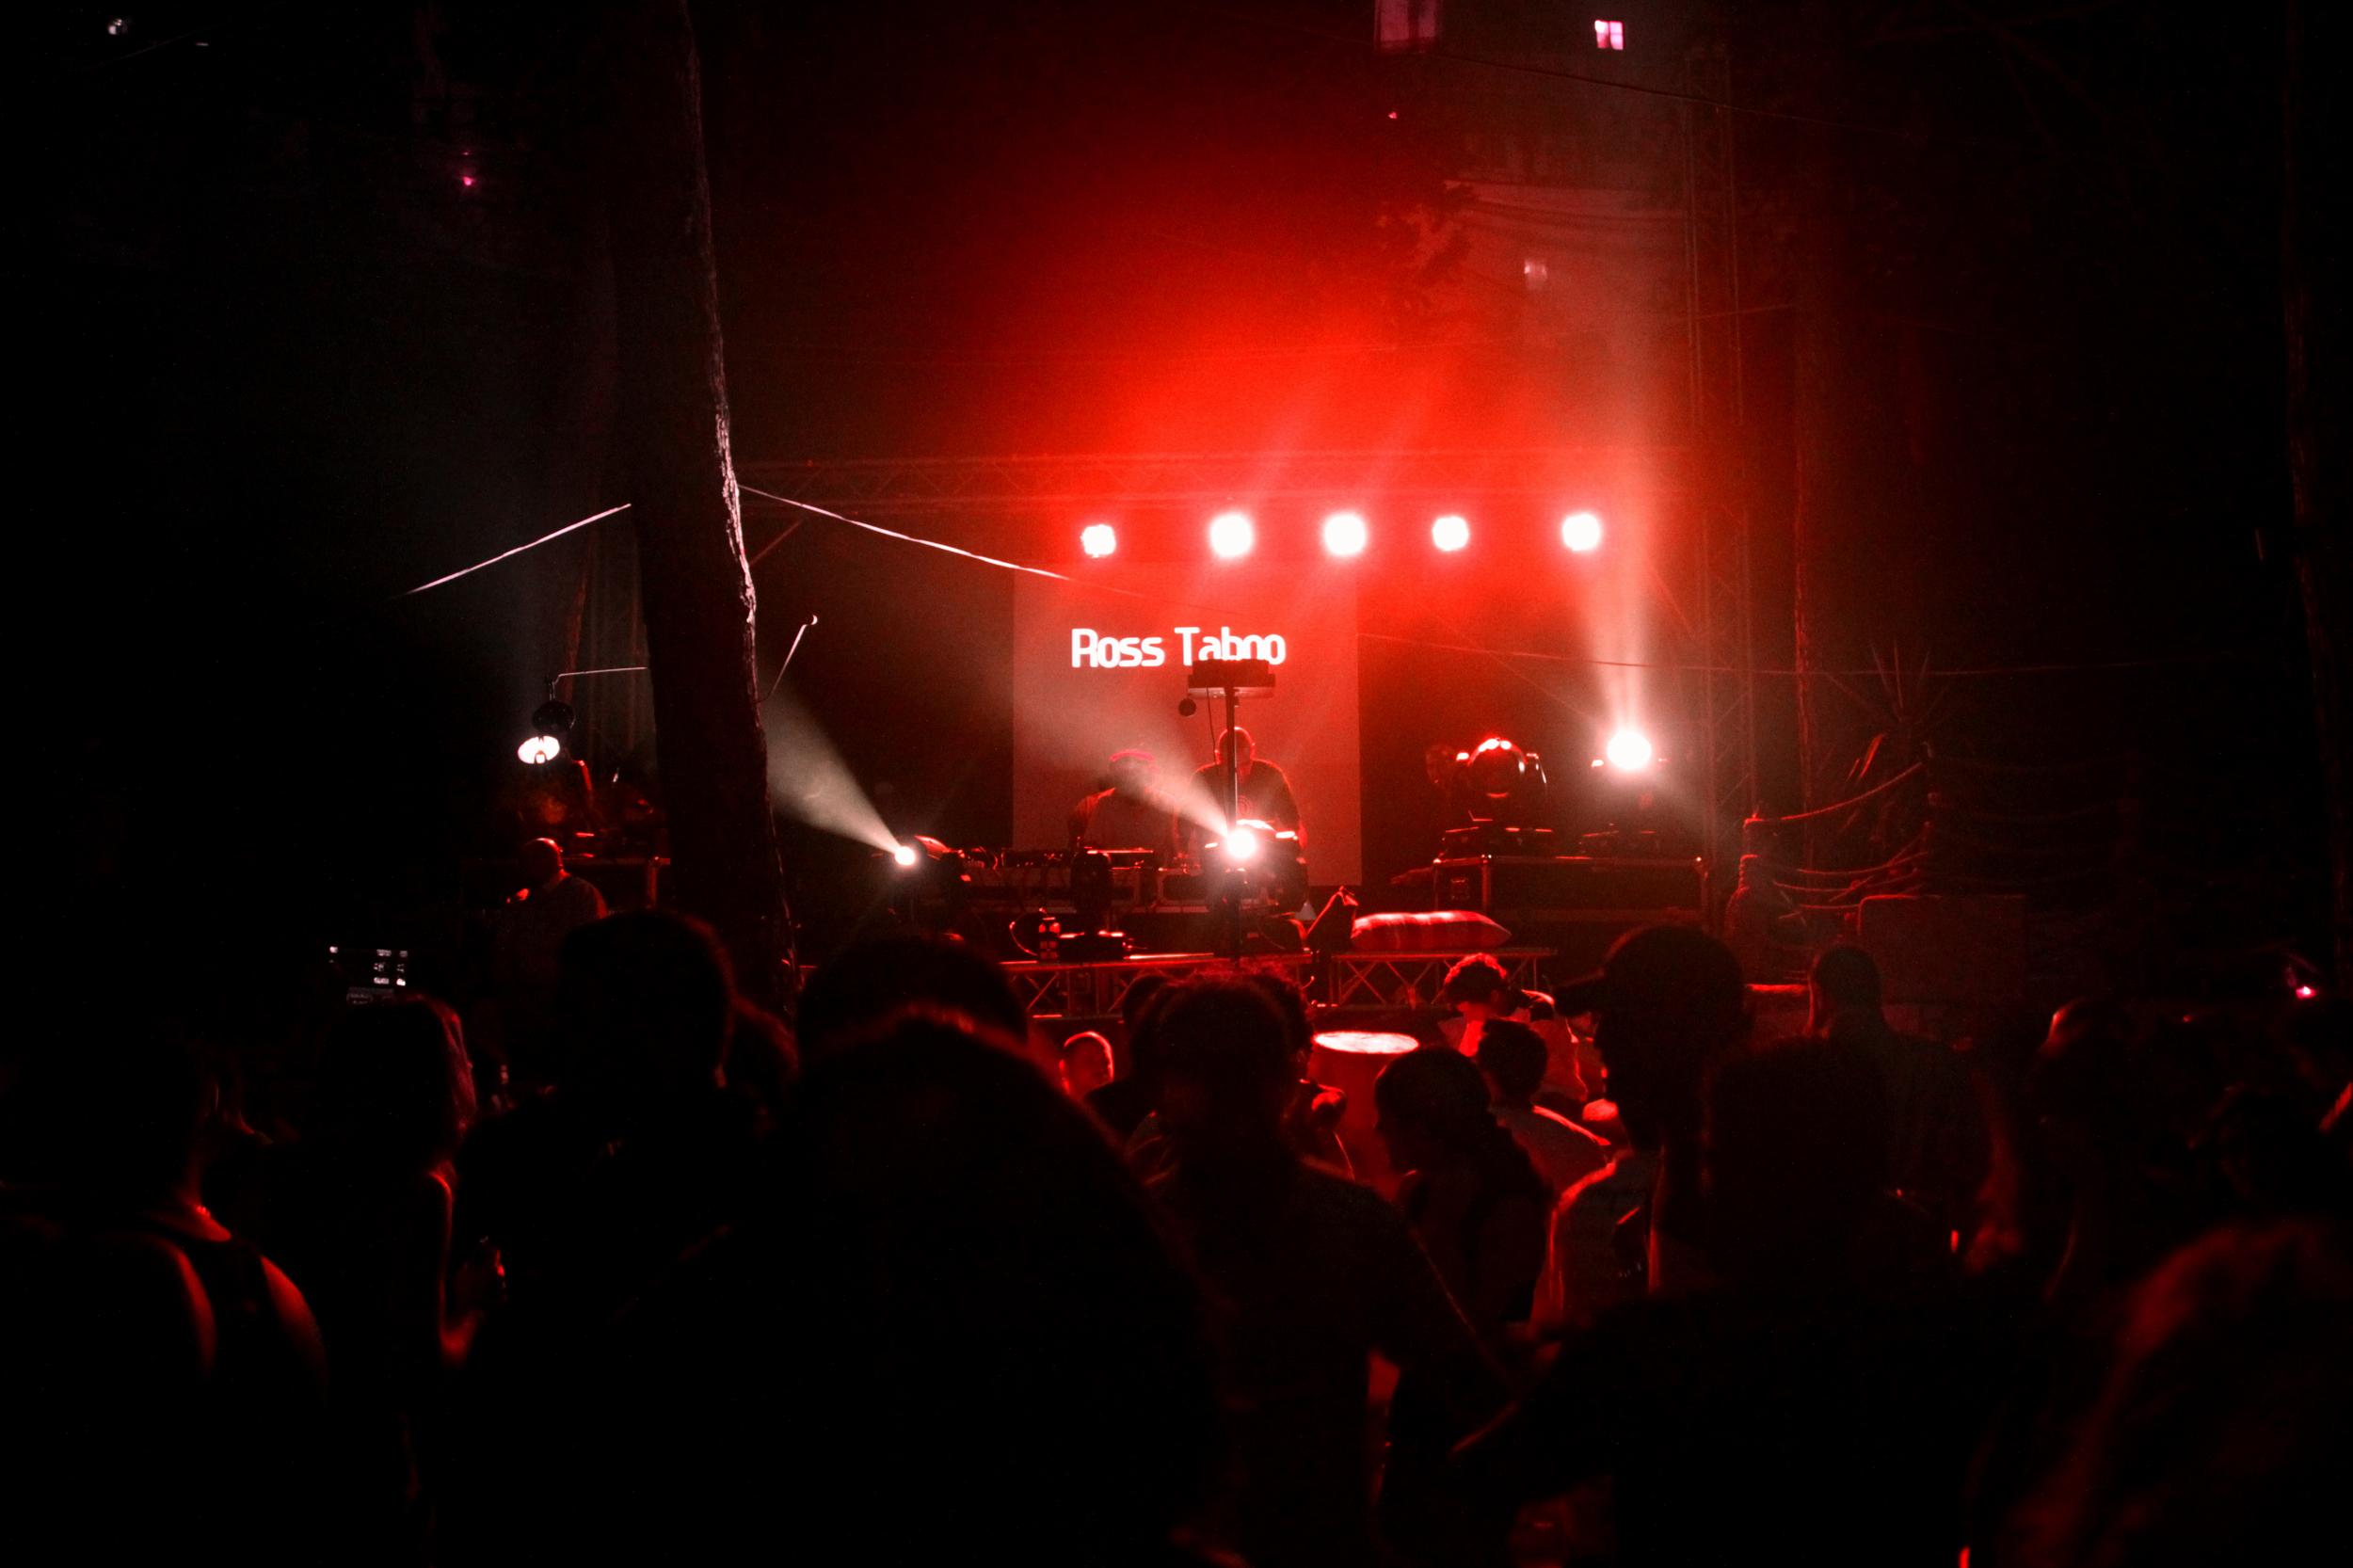 Ross Taboo playing at Snowbar Ramalah, Progressive Psytrance